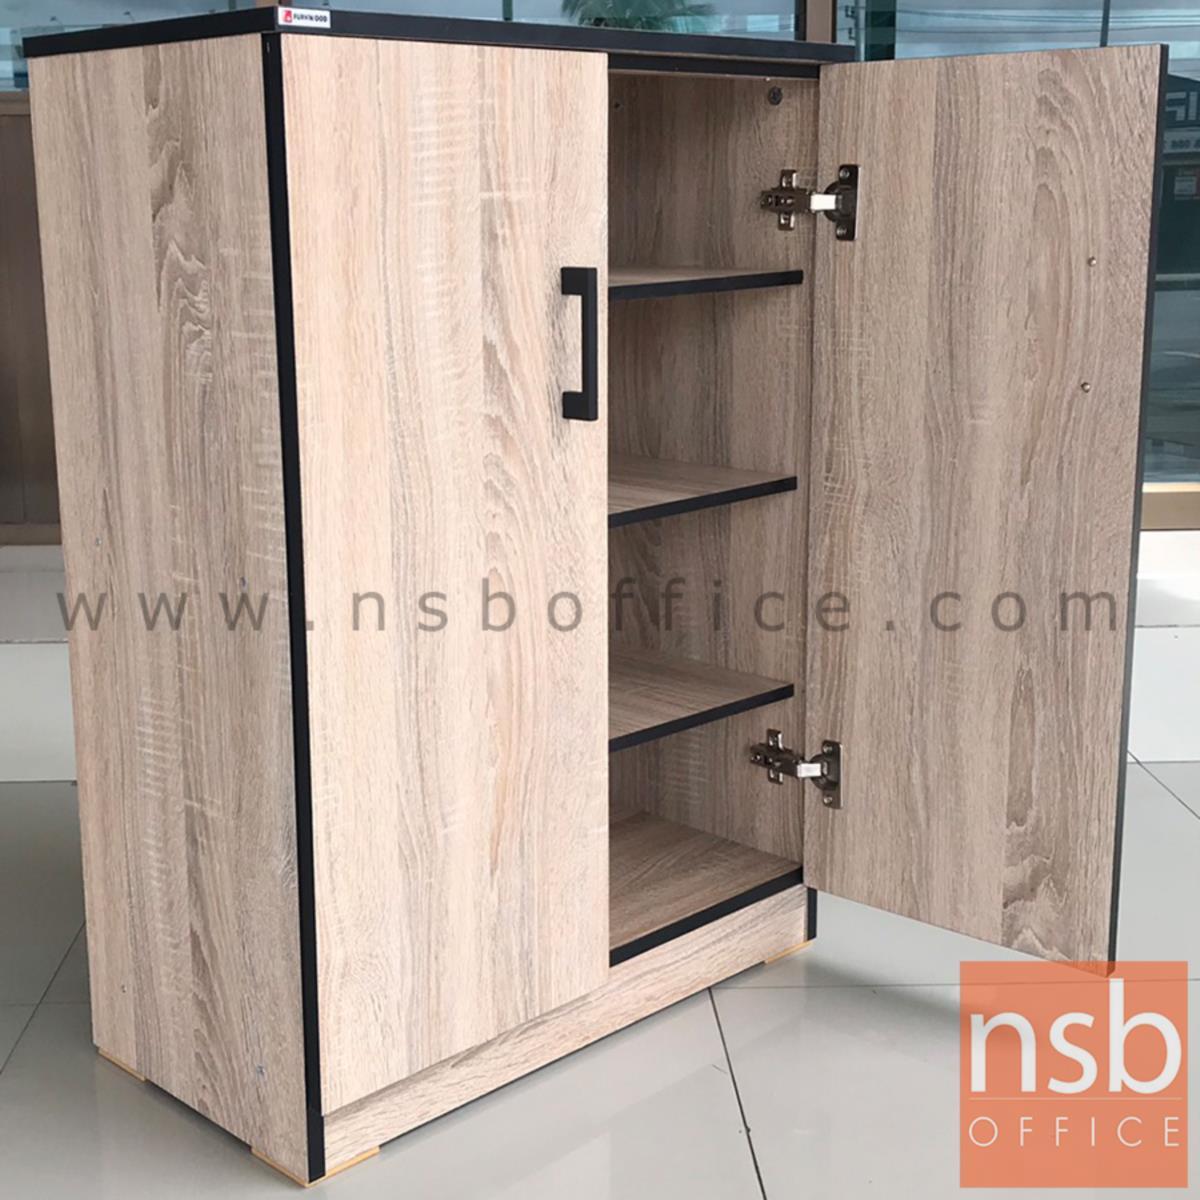 G05A066:ตู้เก็บรองเท้า 2 บานเปิด รุ่น FW-SH2 ขนาด 60W*82.5H cm. PVC สีโซลิค-ขอบดำ